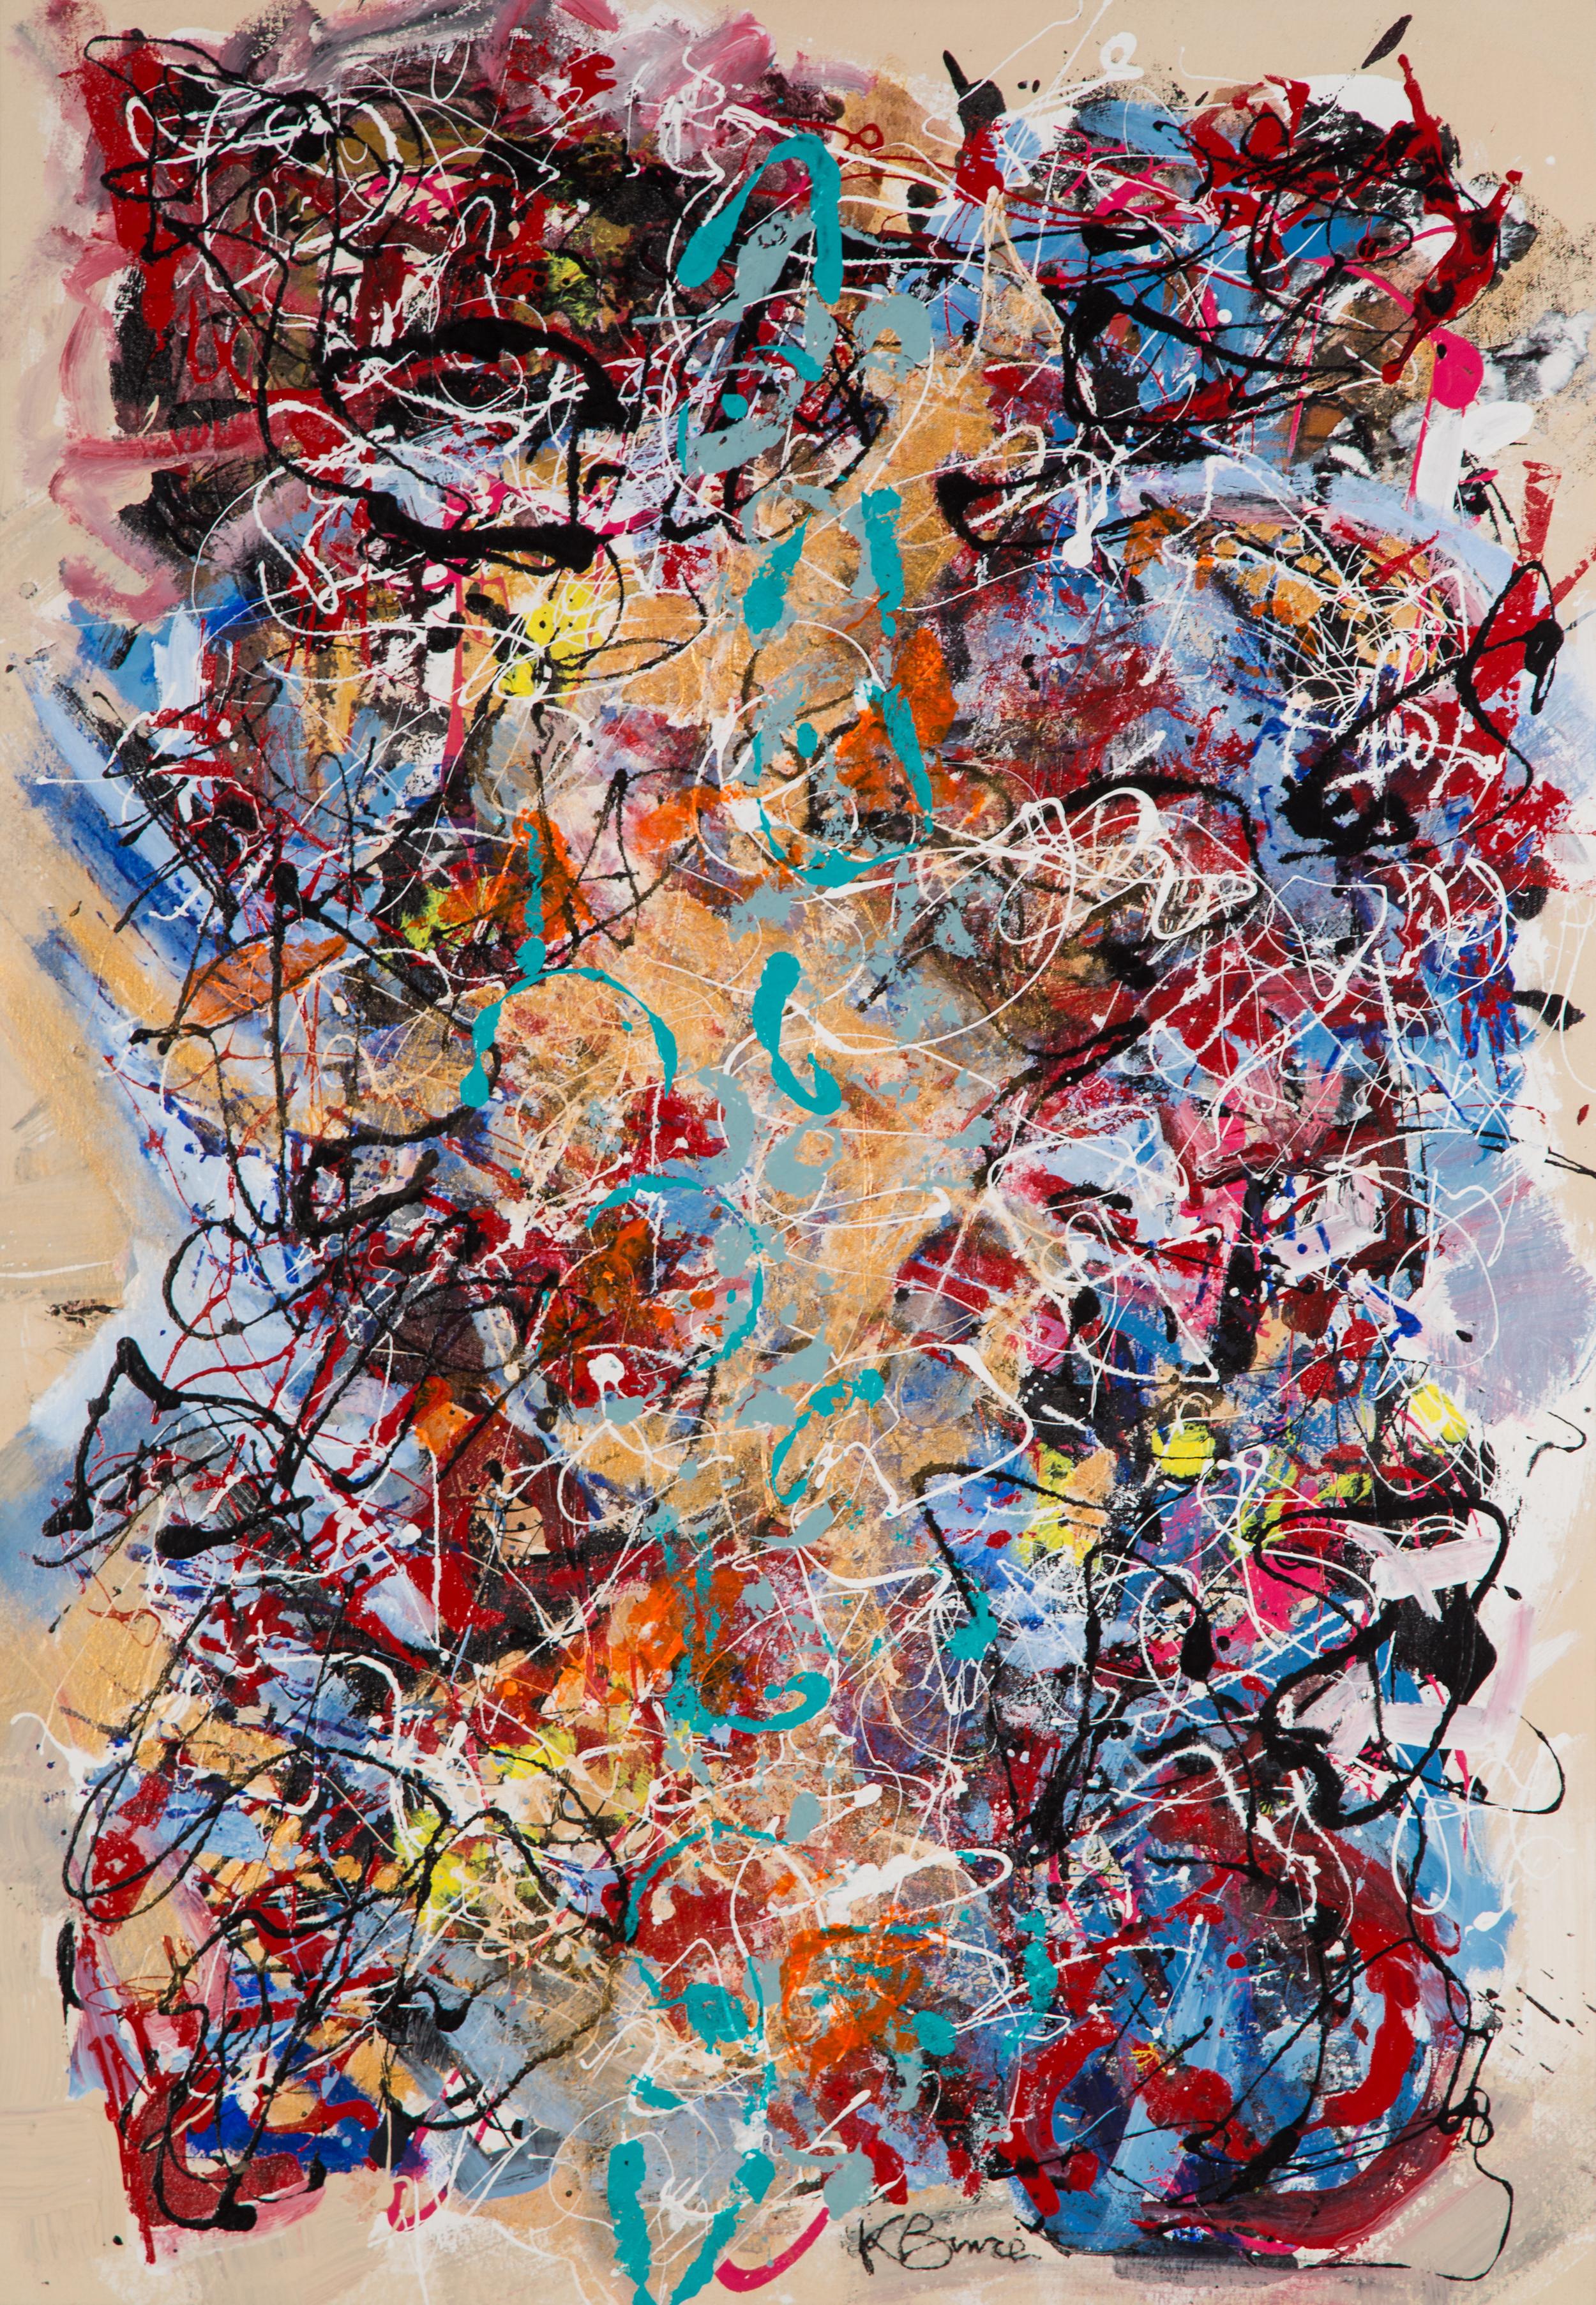 KB-071, Katharine Bruce, Tidepool Swagger, 2011, Acrylic on Canvas, 34.25x49.75, $3,250